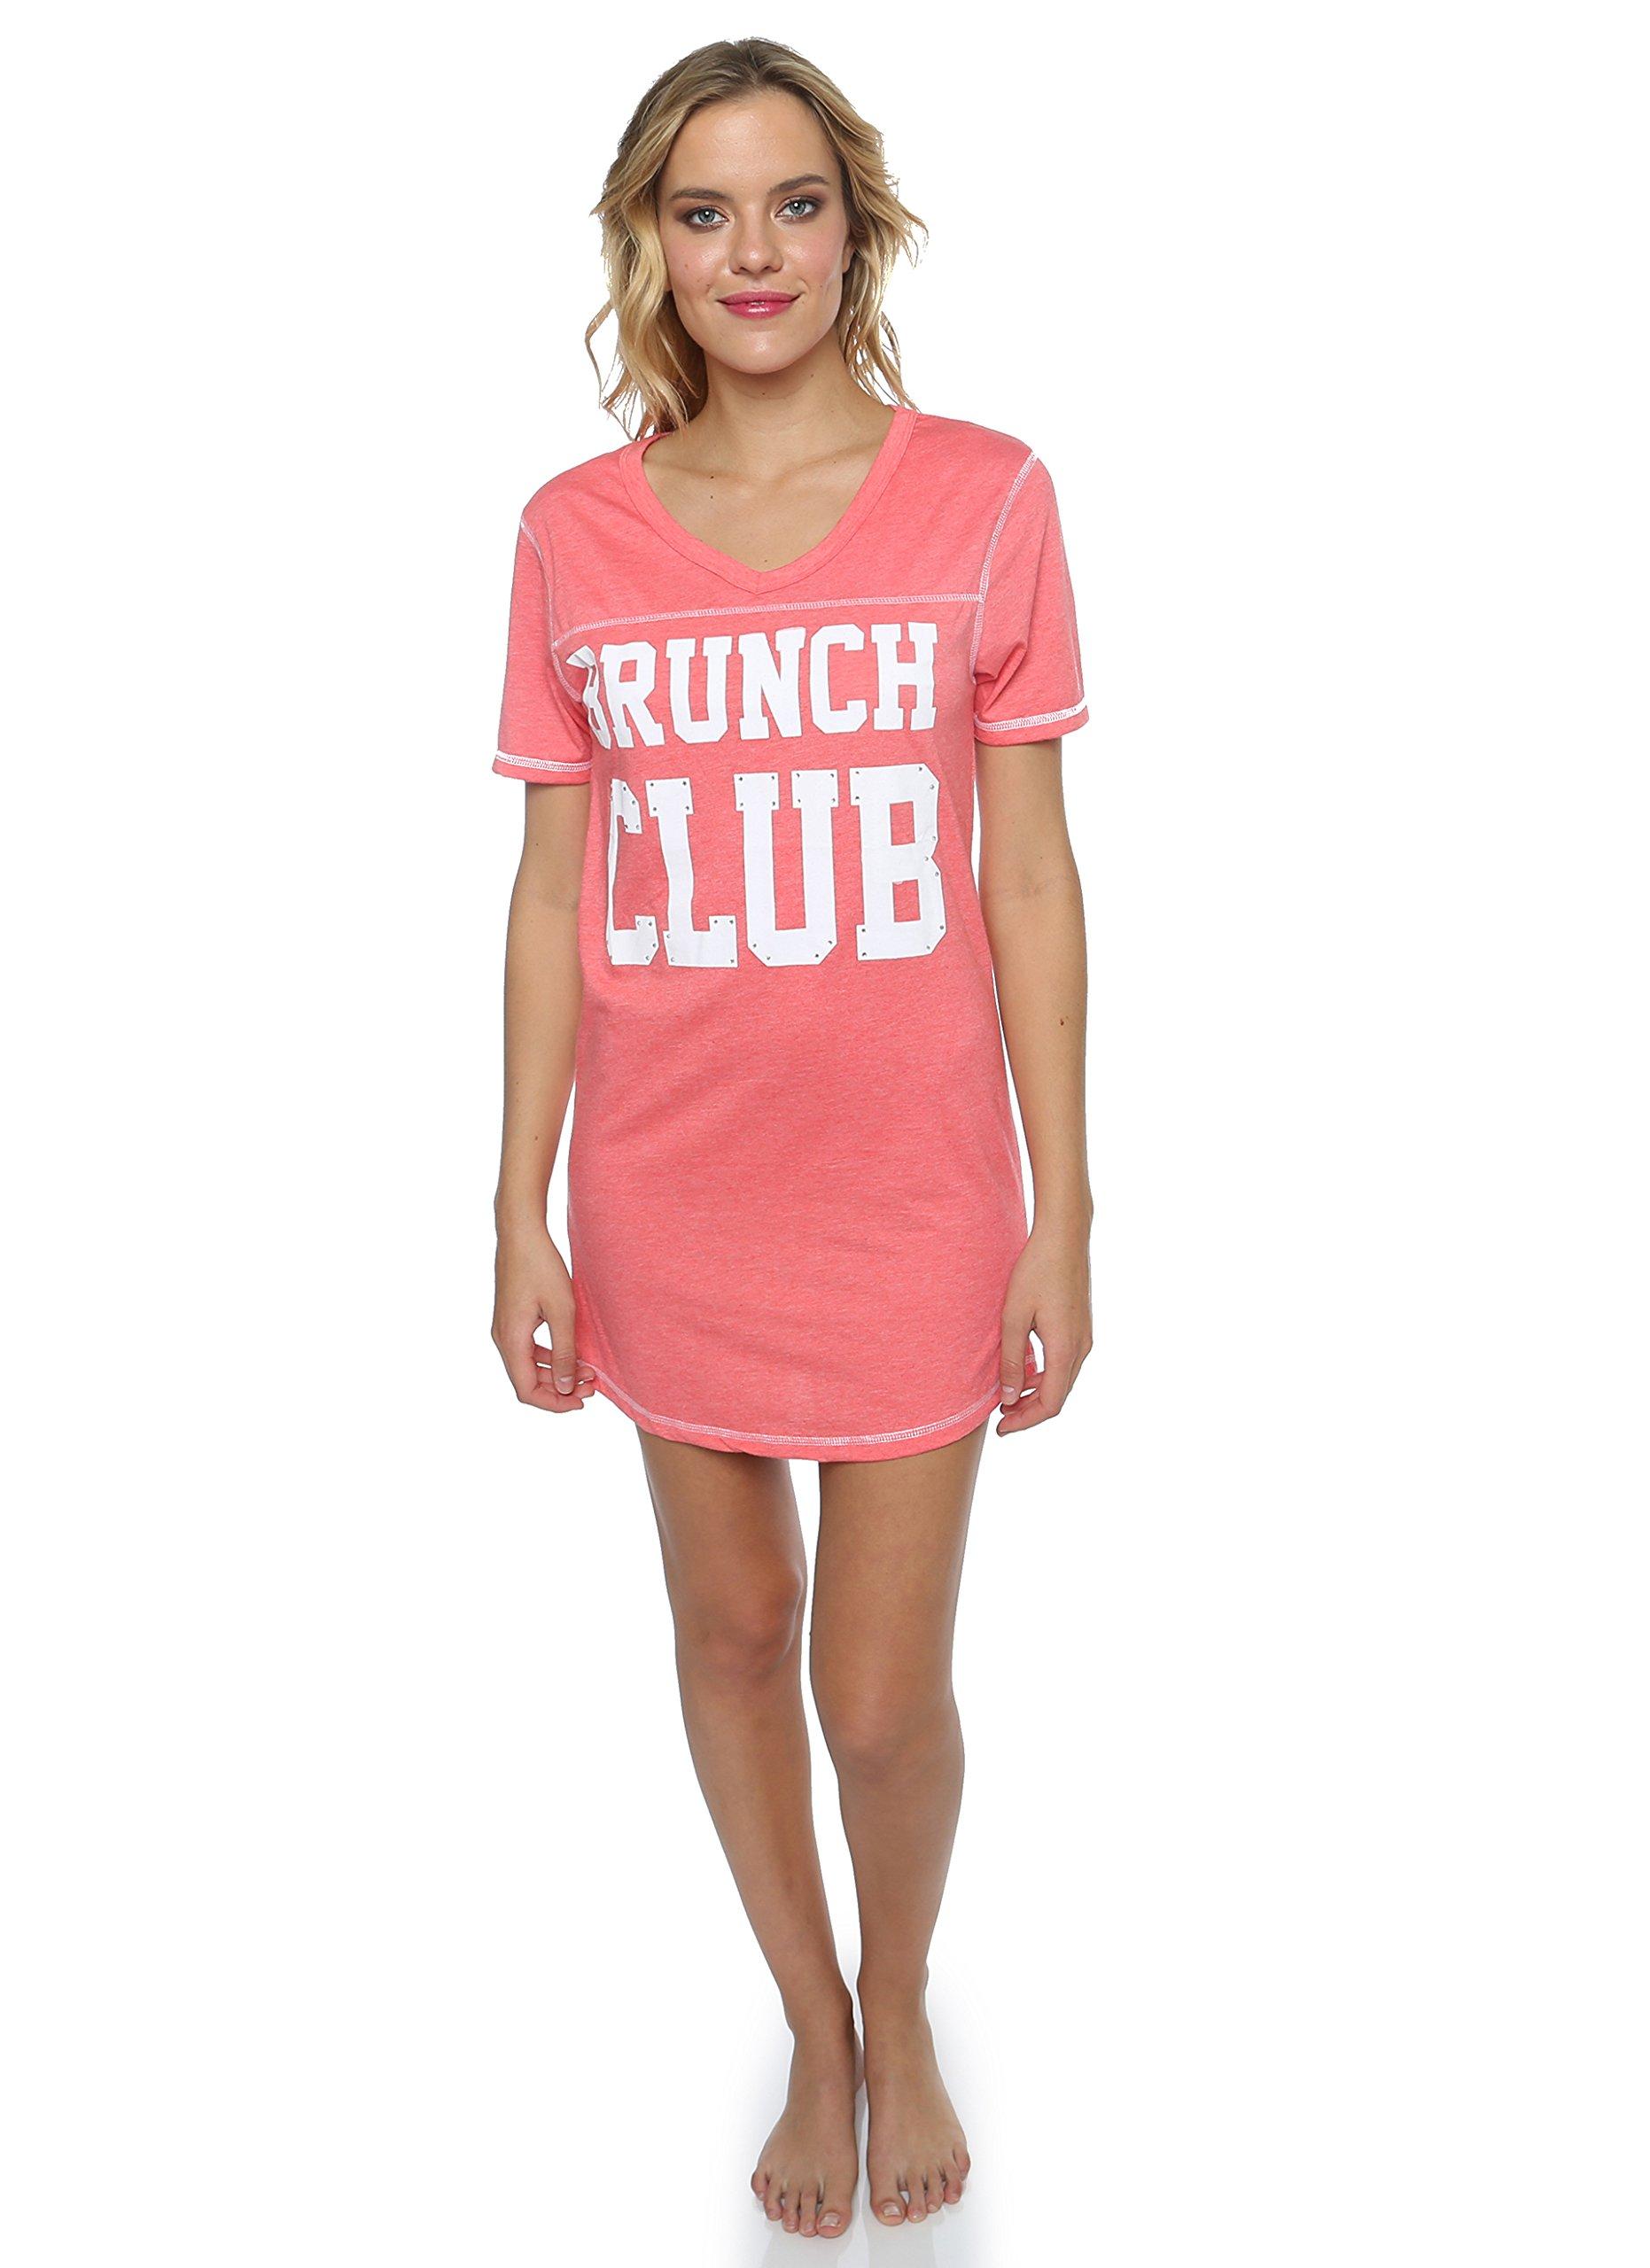 Sleep & Co. Womens Printed Logo Brunch Club V-Neck Sleepshirt Coral Heather Medium